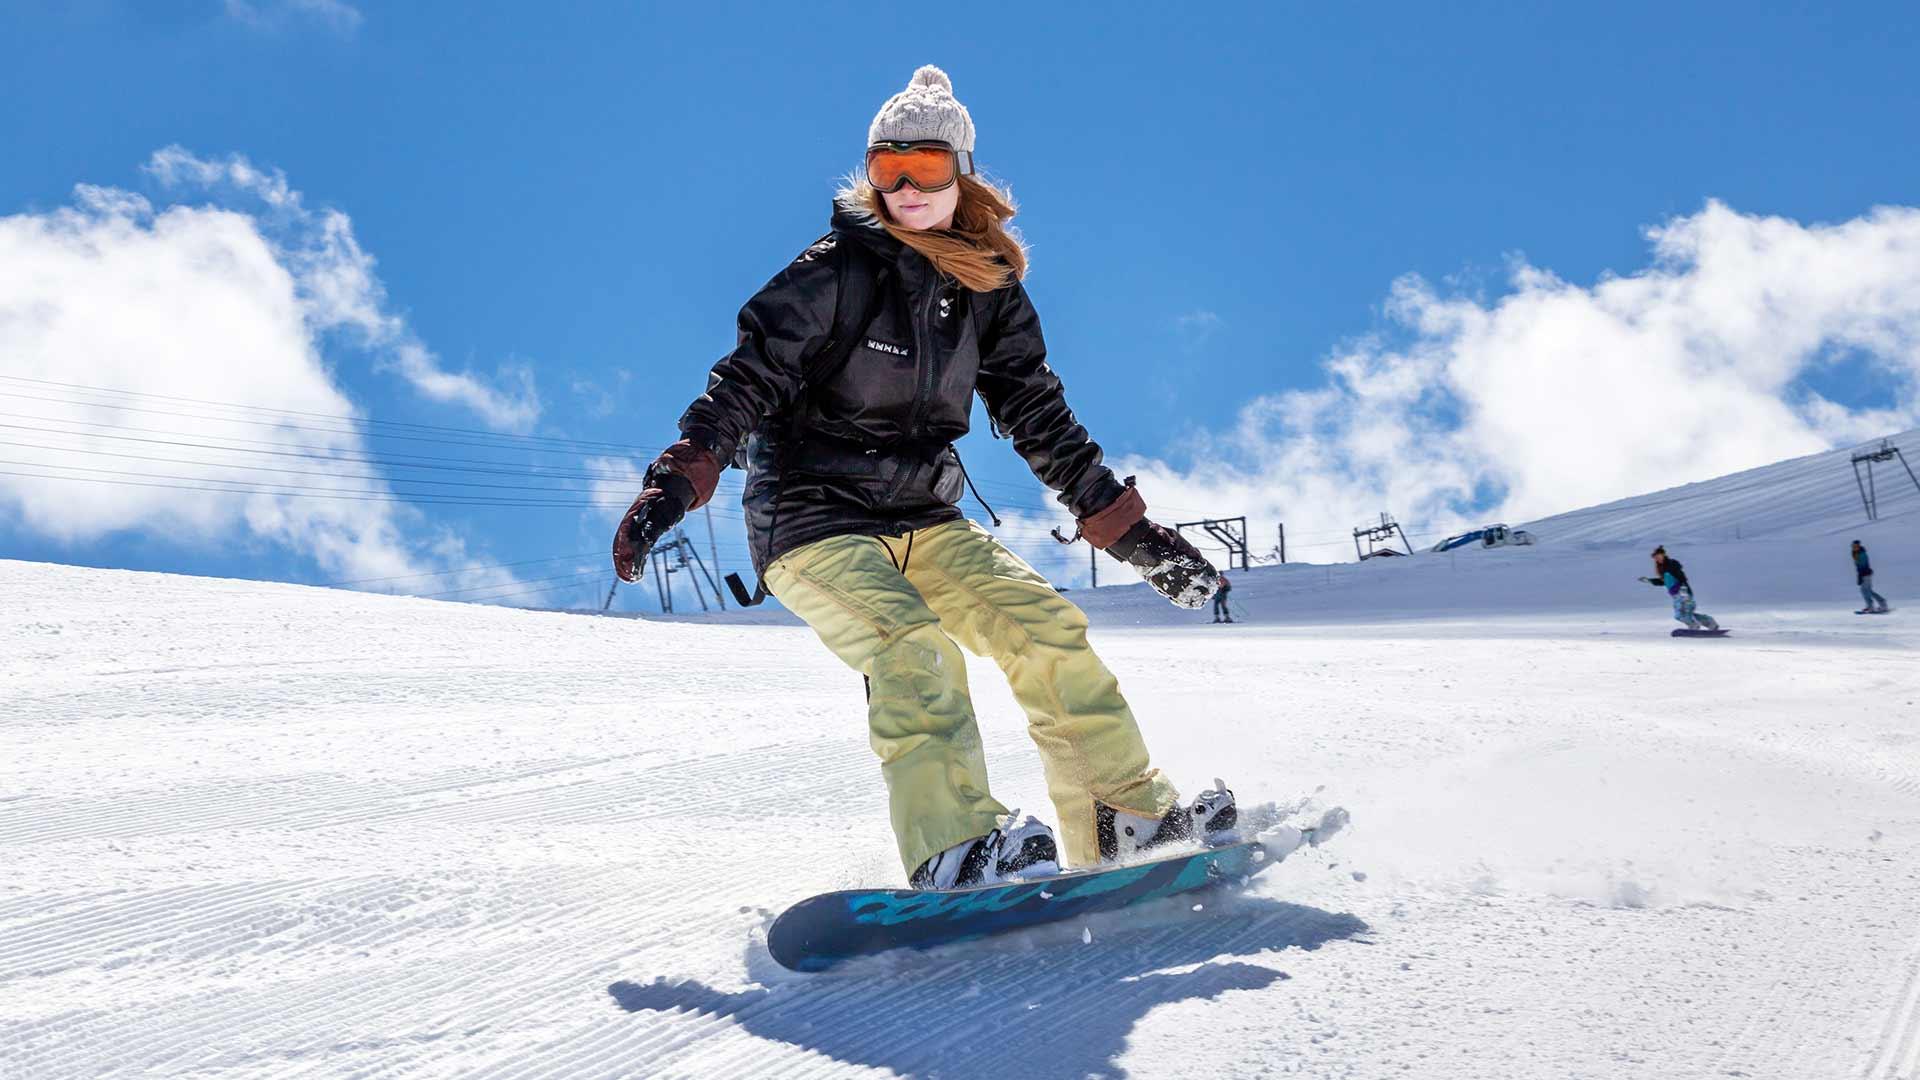 Skiurlaub in Meran & Umgebung - Snowboarden